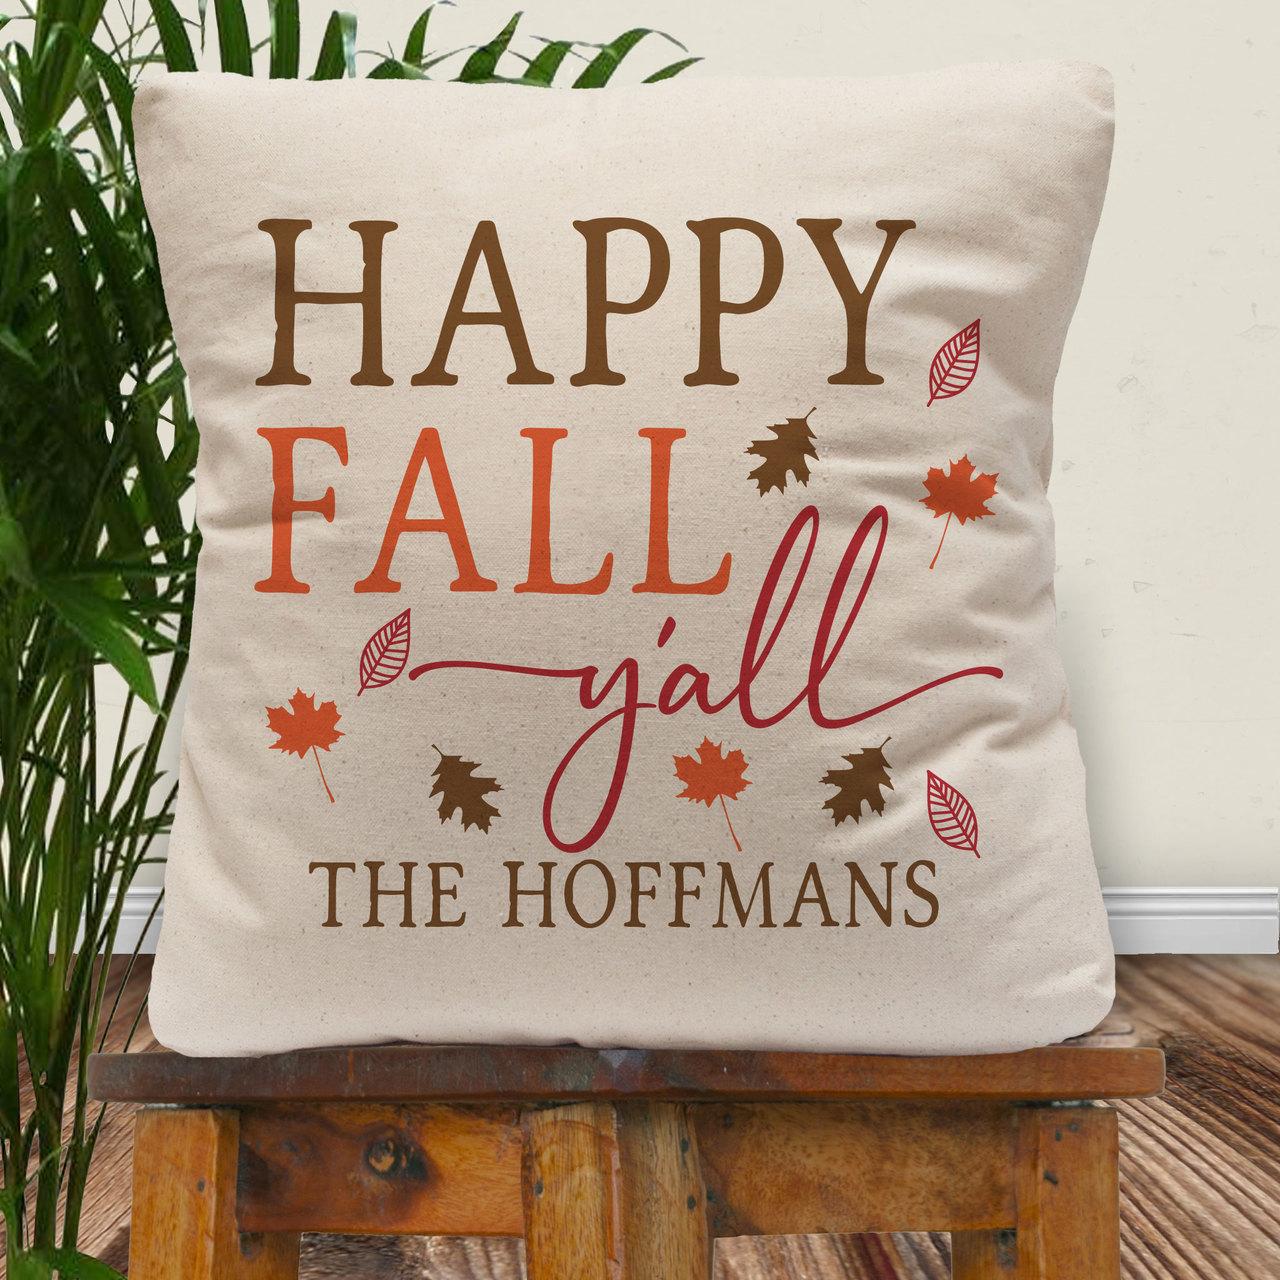 happy-fall-yall-canvas-pillow-22742.1537994162.jpg